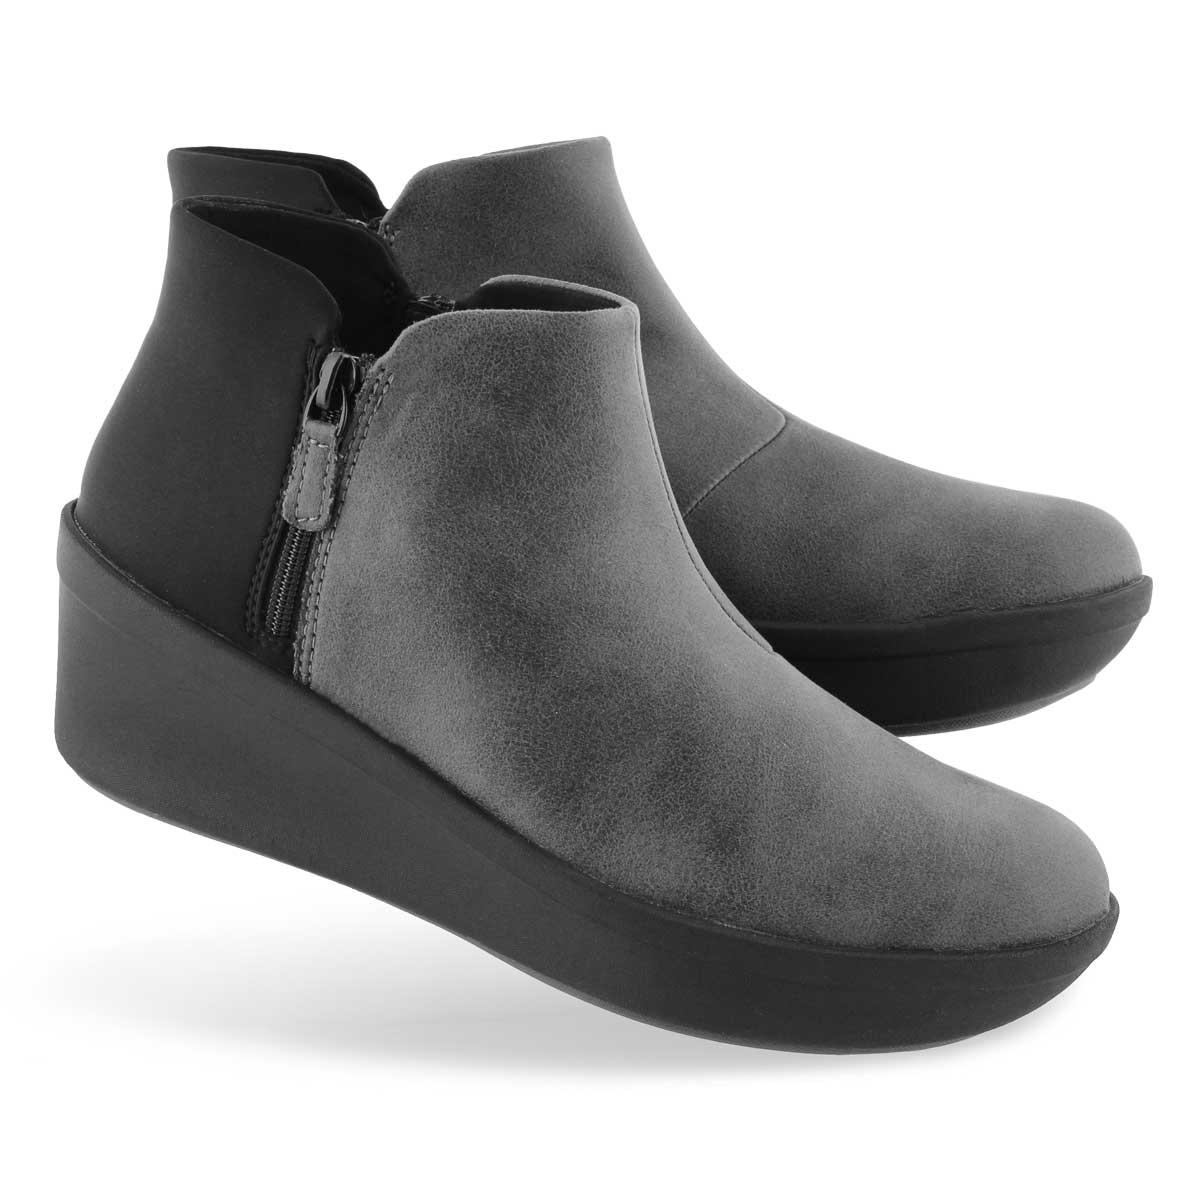 Lds Step Rose Up grey slip on boot